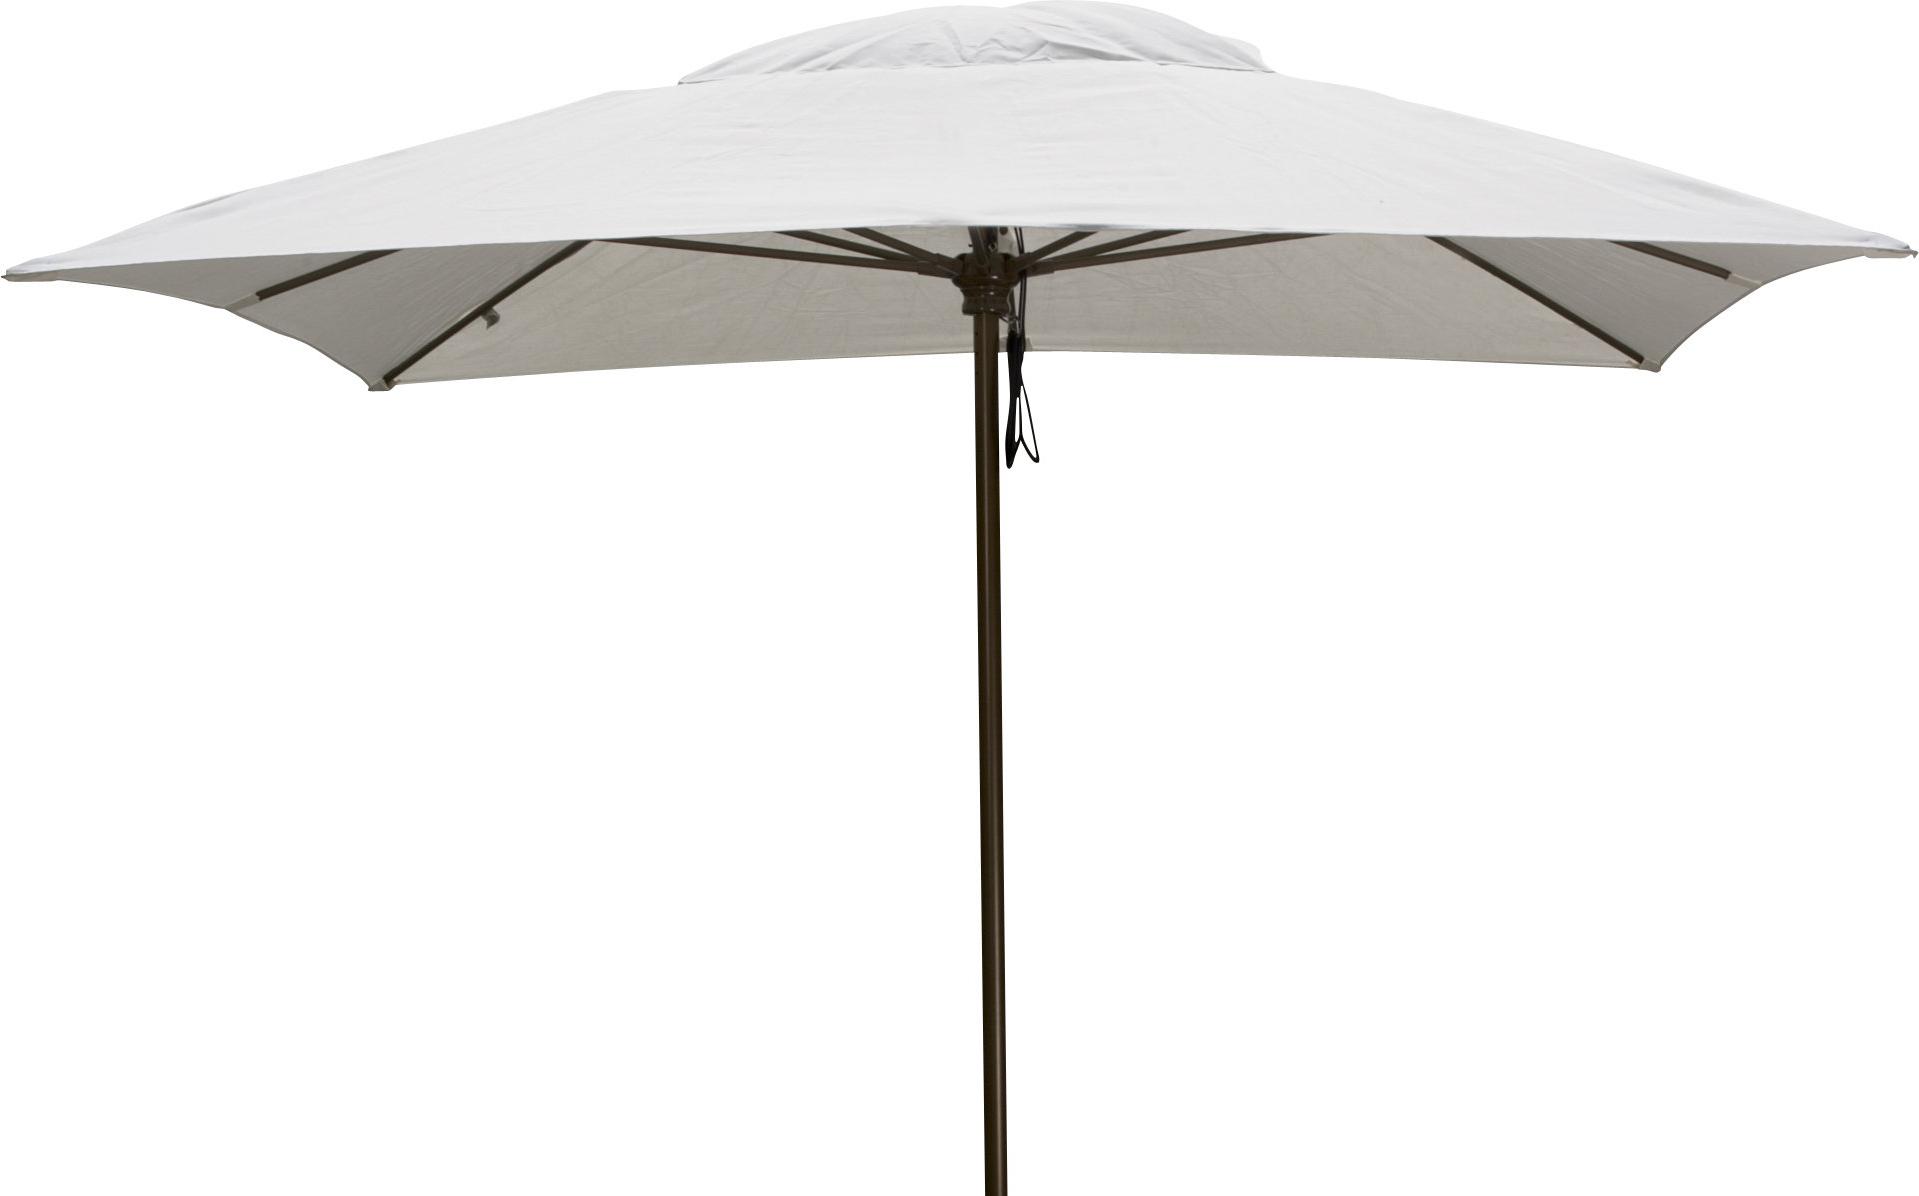 Most Popular Square Market Umbrellas – Budapestsightseeing With Crowborough Square Market Umbrellas (View 13 of 20)